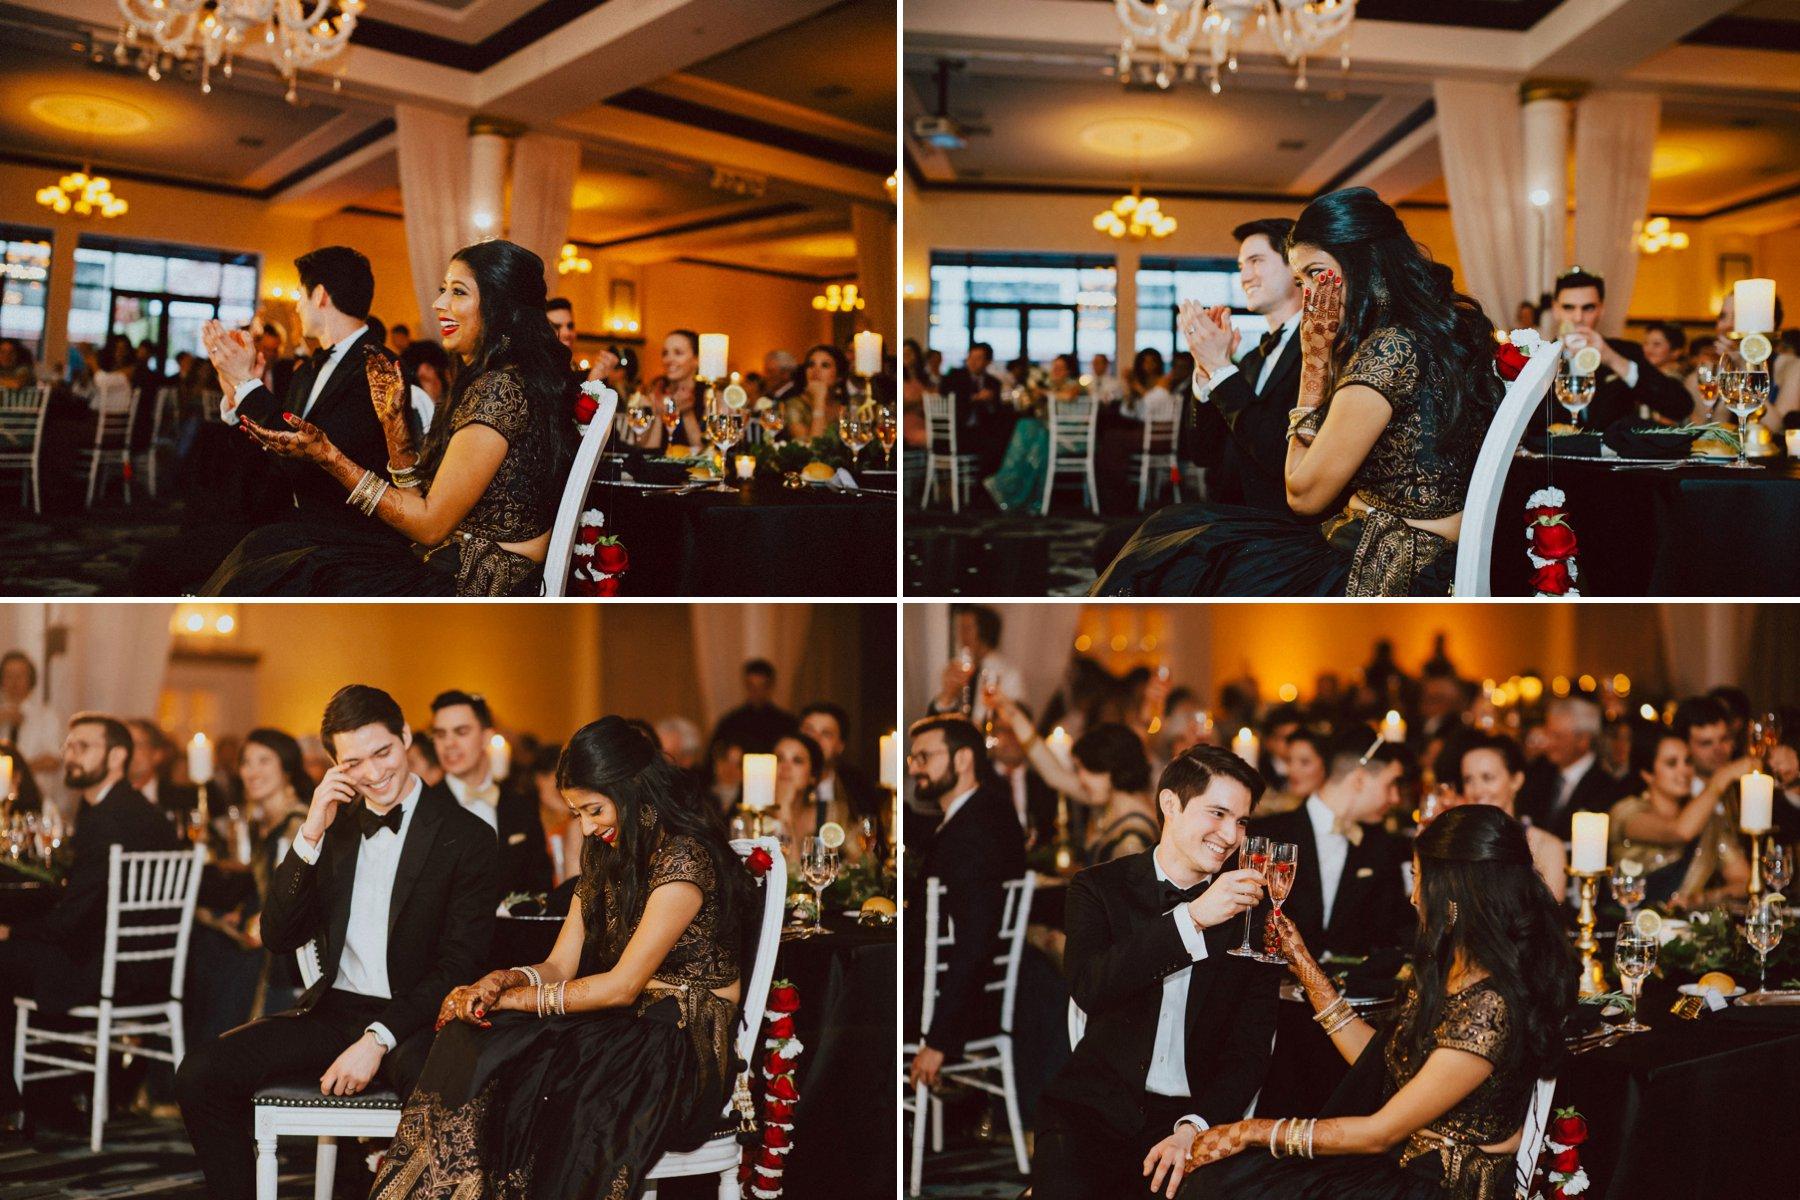 vie-philadelphia-indian-wedding-106.jpg